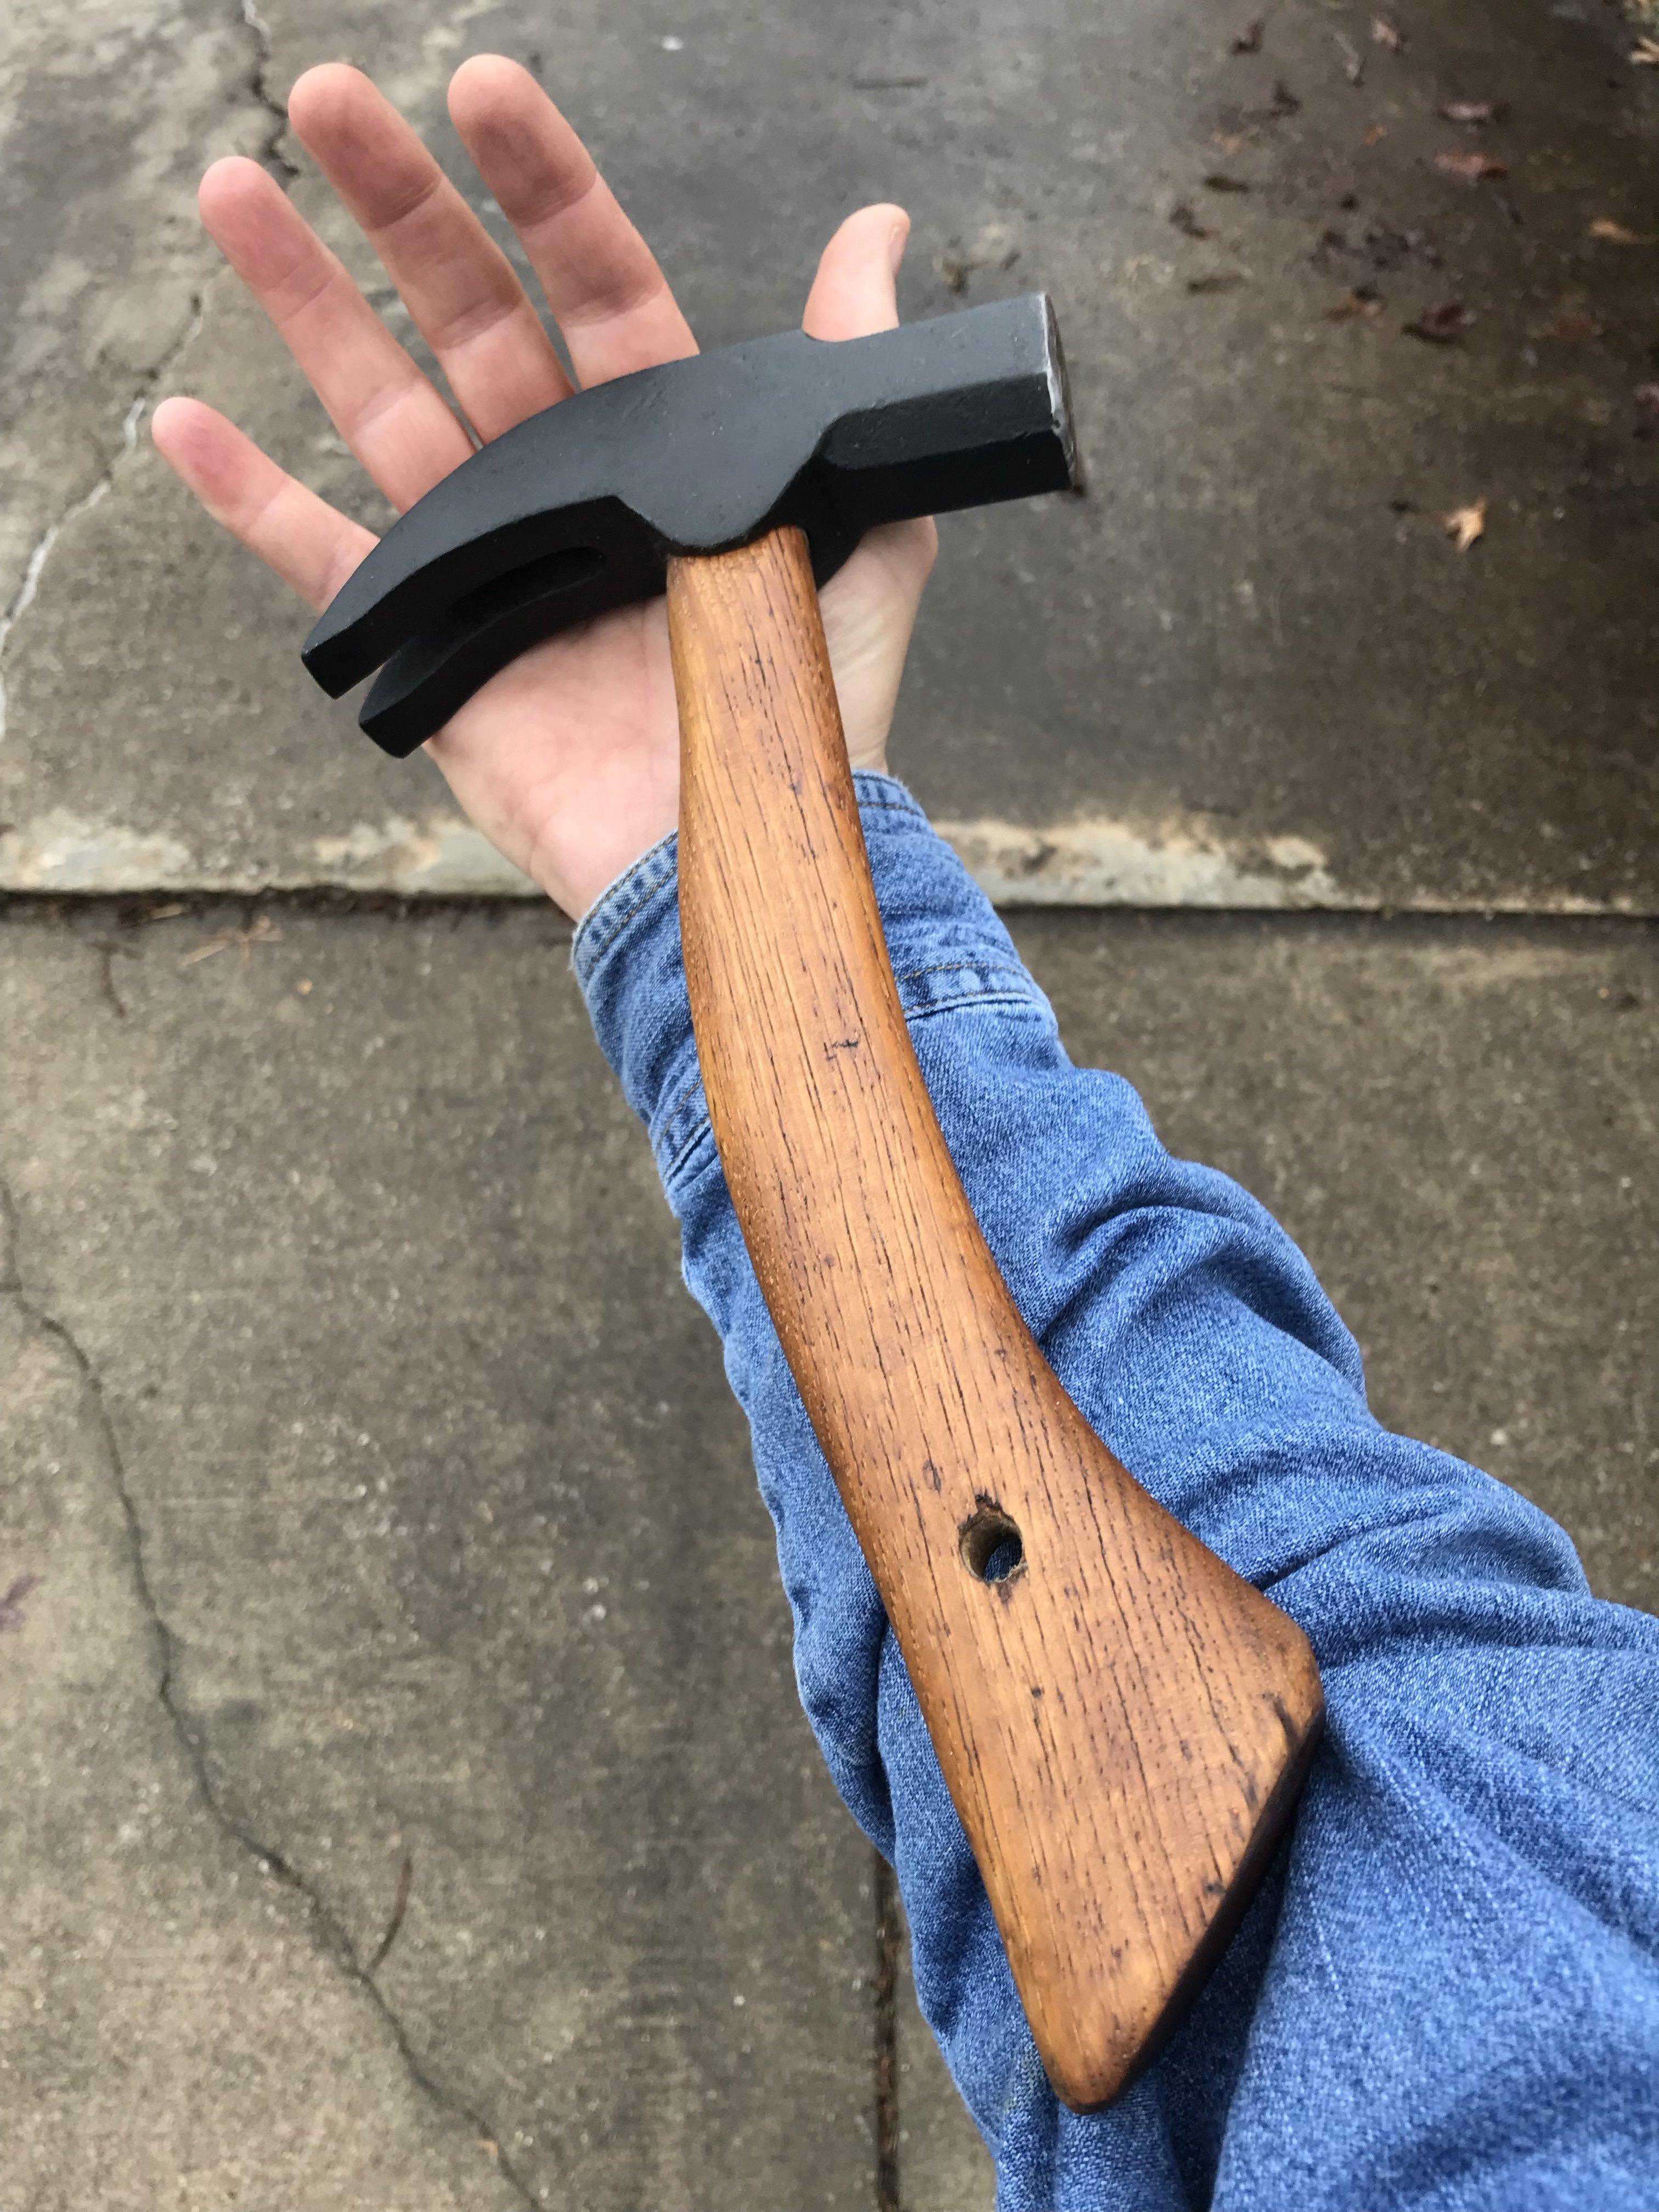 Woodworking Hobbies Page 2 Arkansas Hunting Your Arkansas